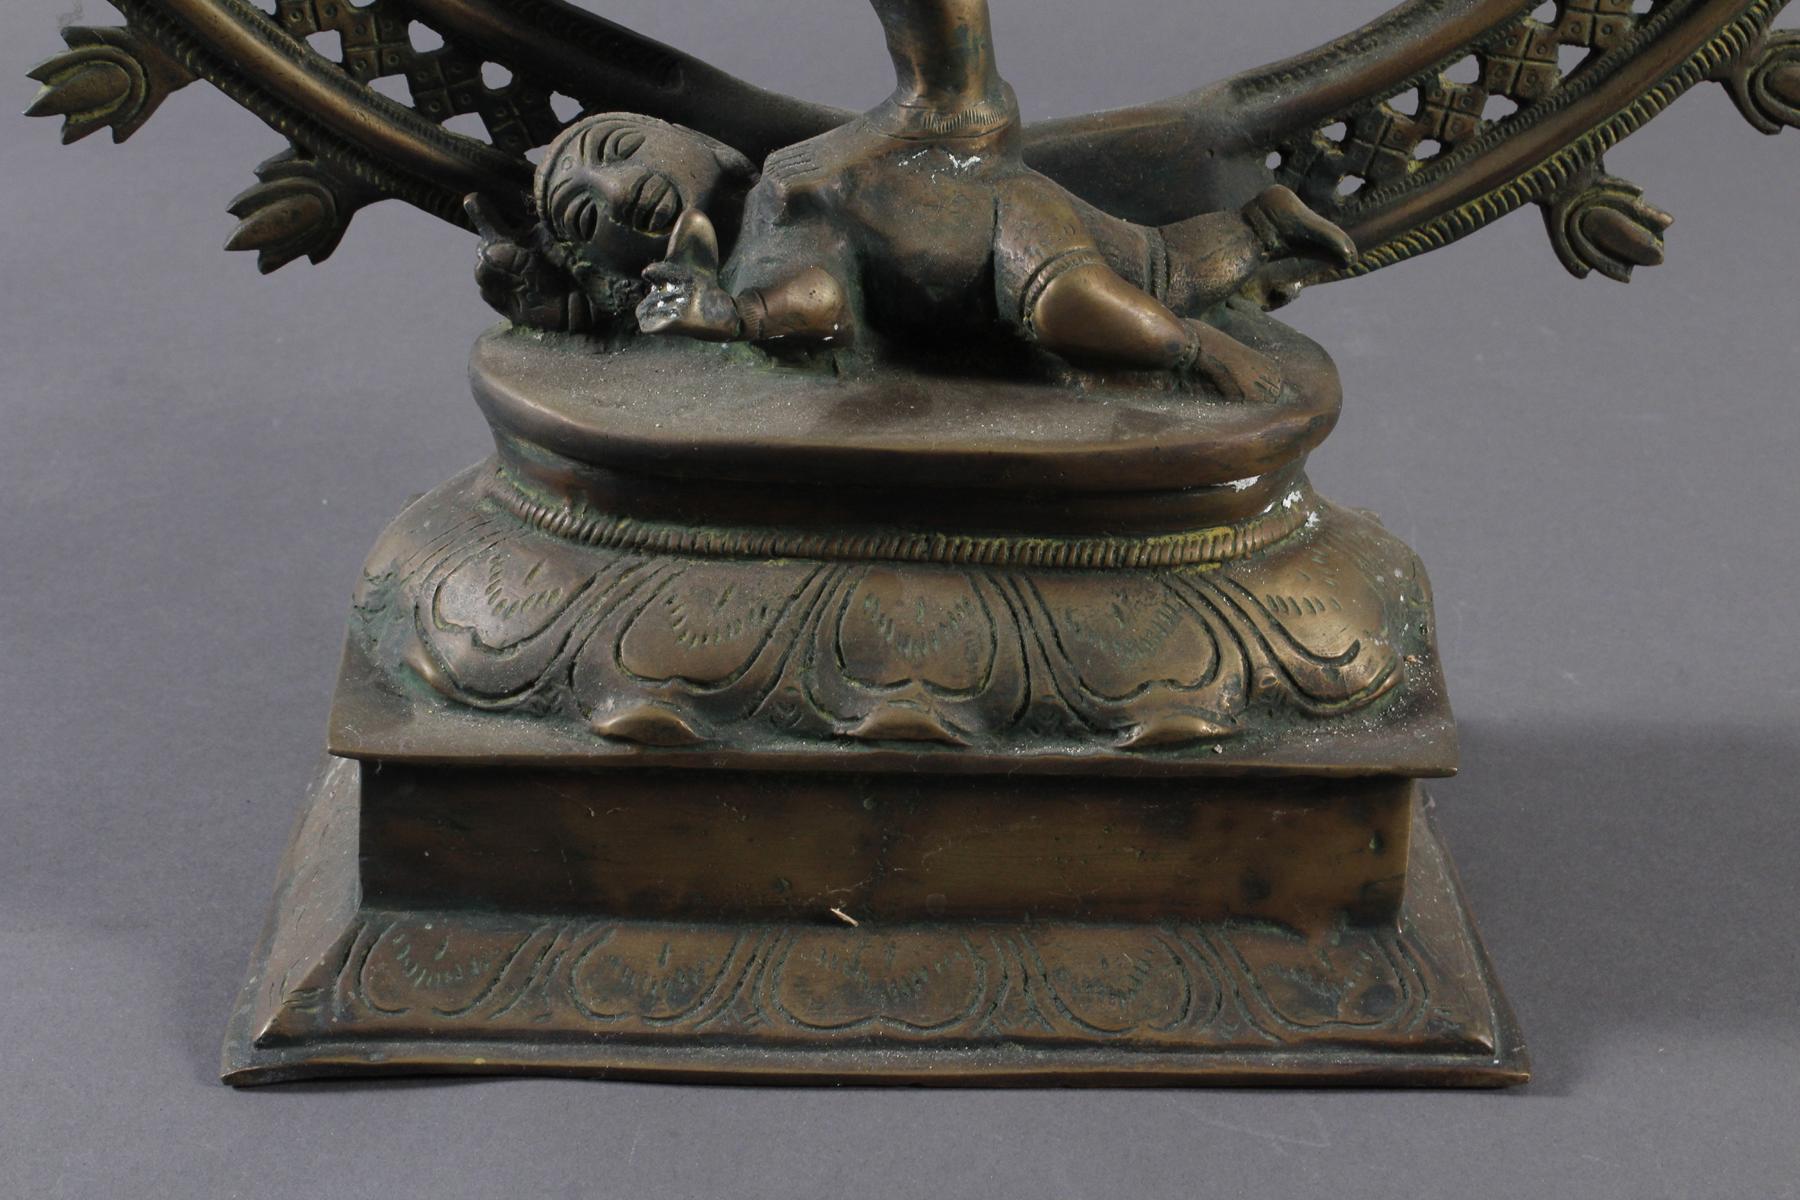 Nataraja Shiva im Flammenrad, Indien, 19. / 20. Jahrhundert-3